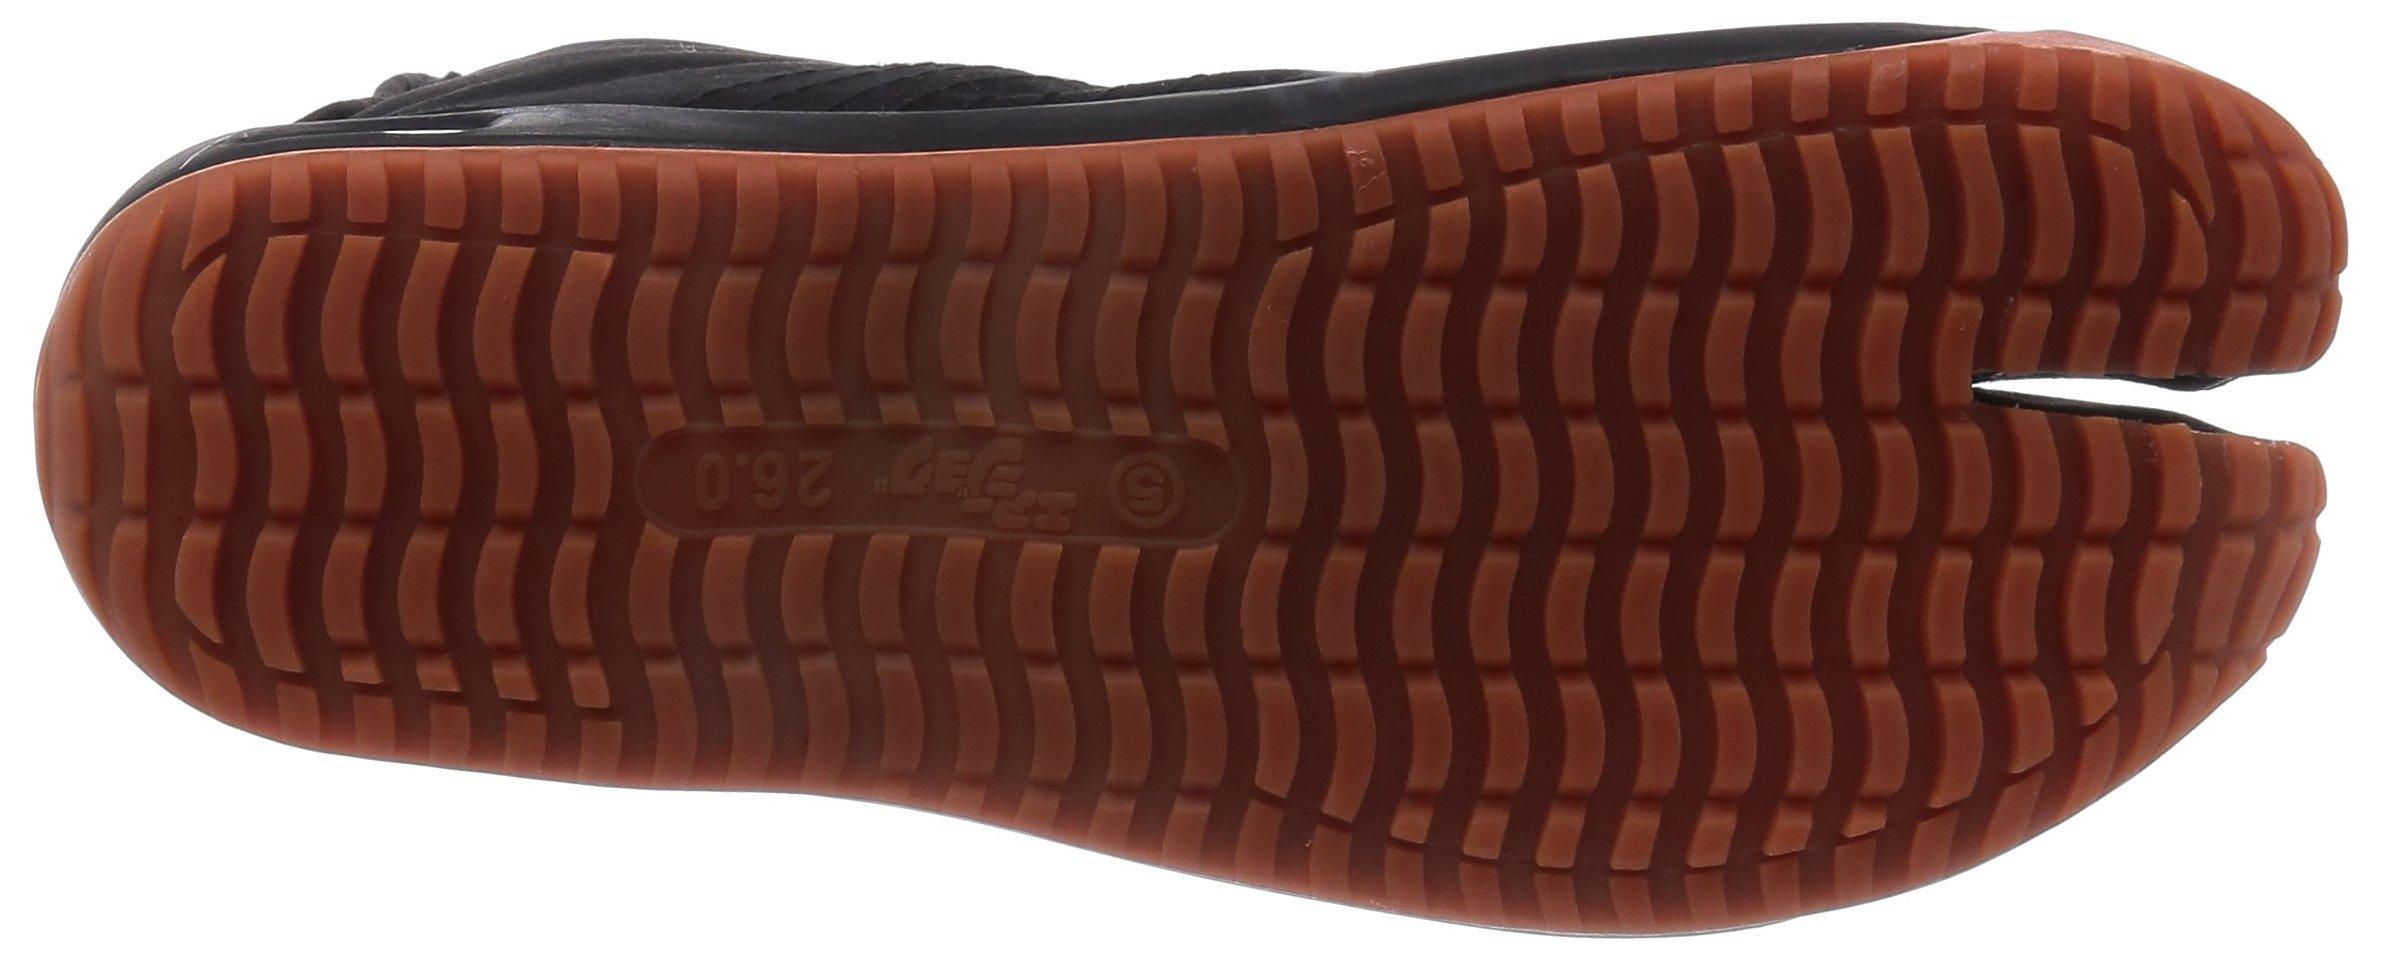 Ninja shoes, AIR JOG 6, Jika TabiSize: 25.0 cm (US size 7 ), Color: Black by Marugo (Image #5)